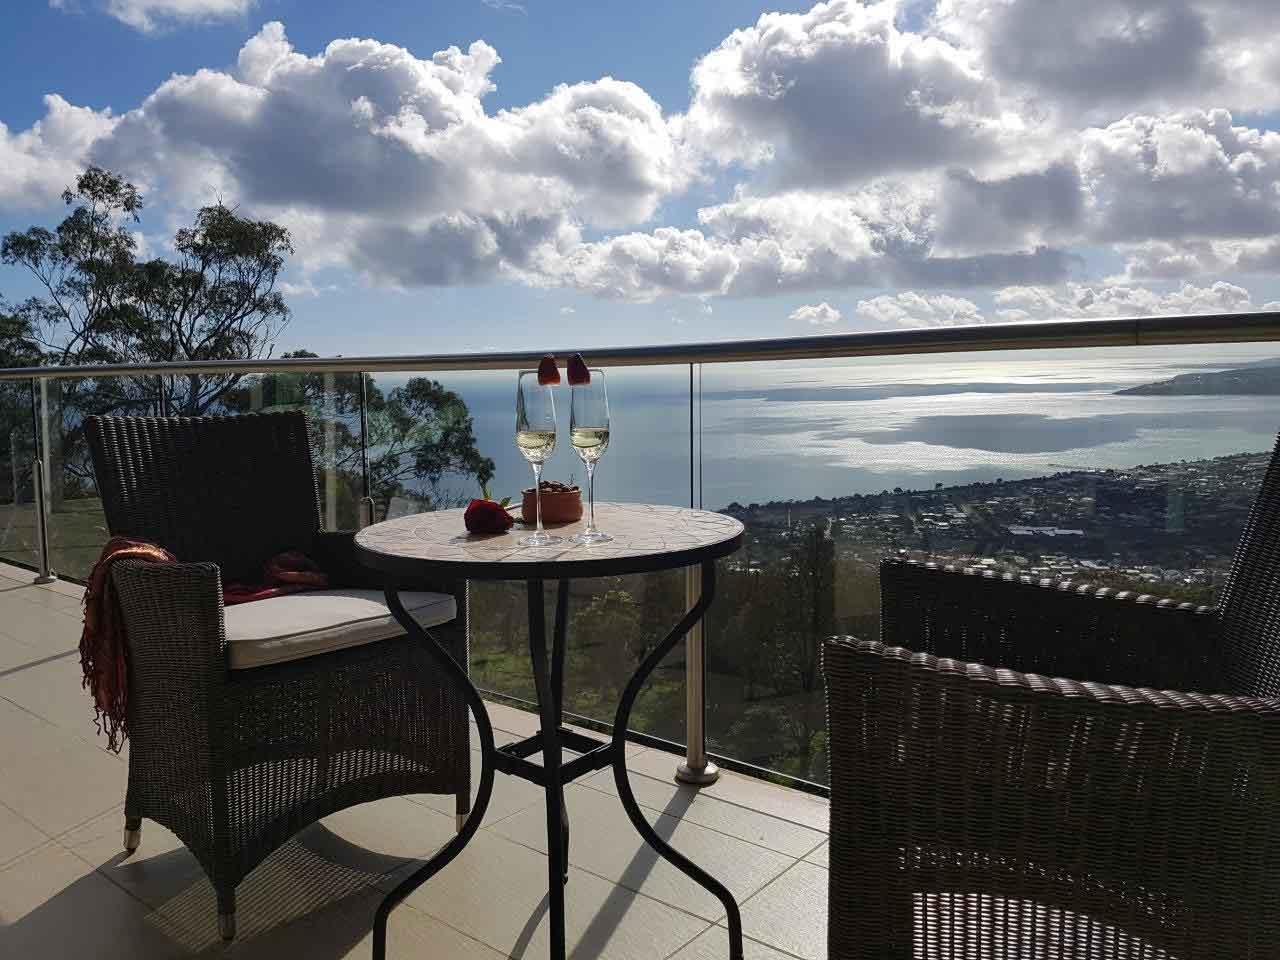 Arthurs Views Bed & Breakfast Balcony View